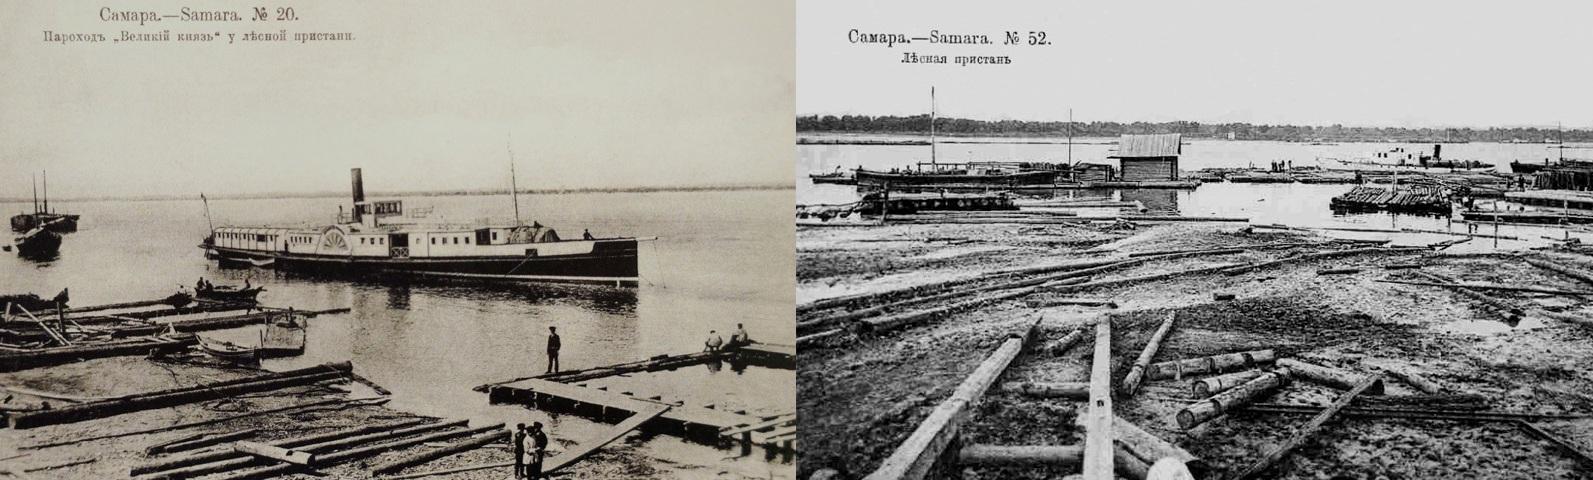 Самарские лесные пристани